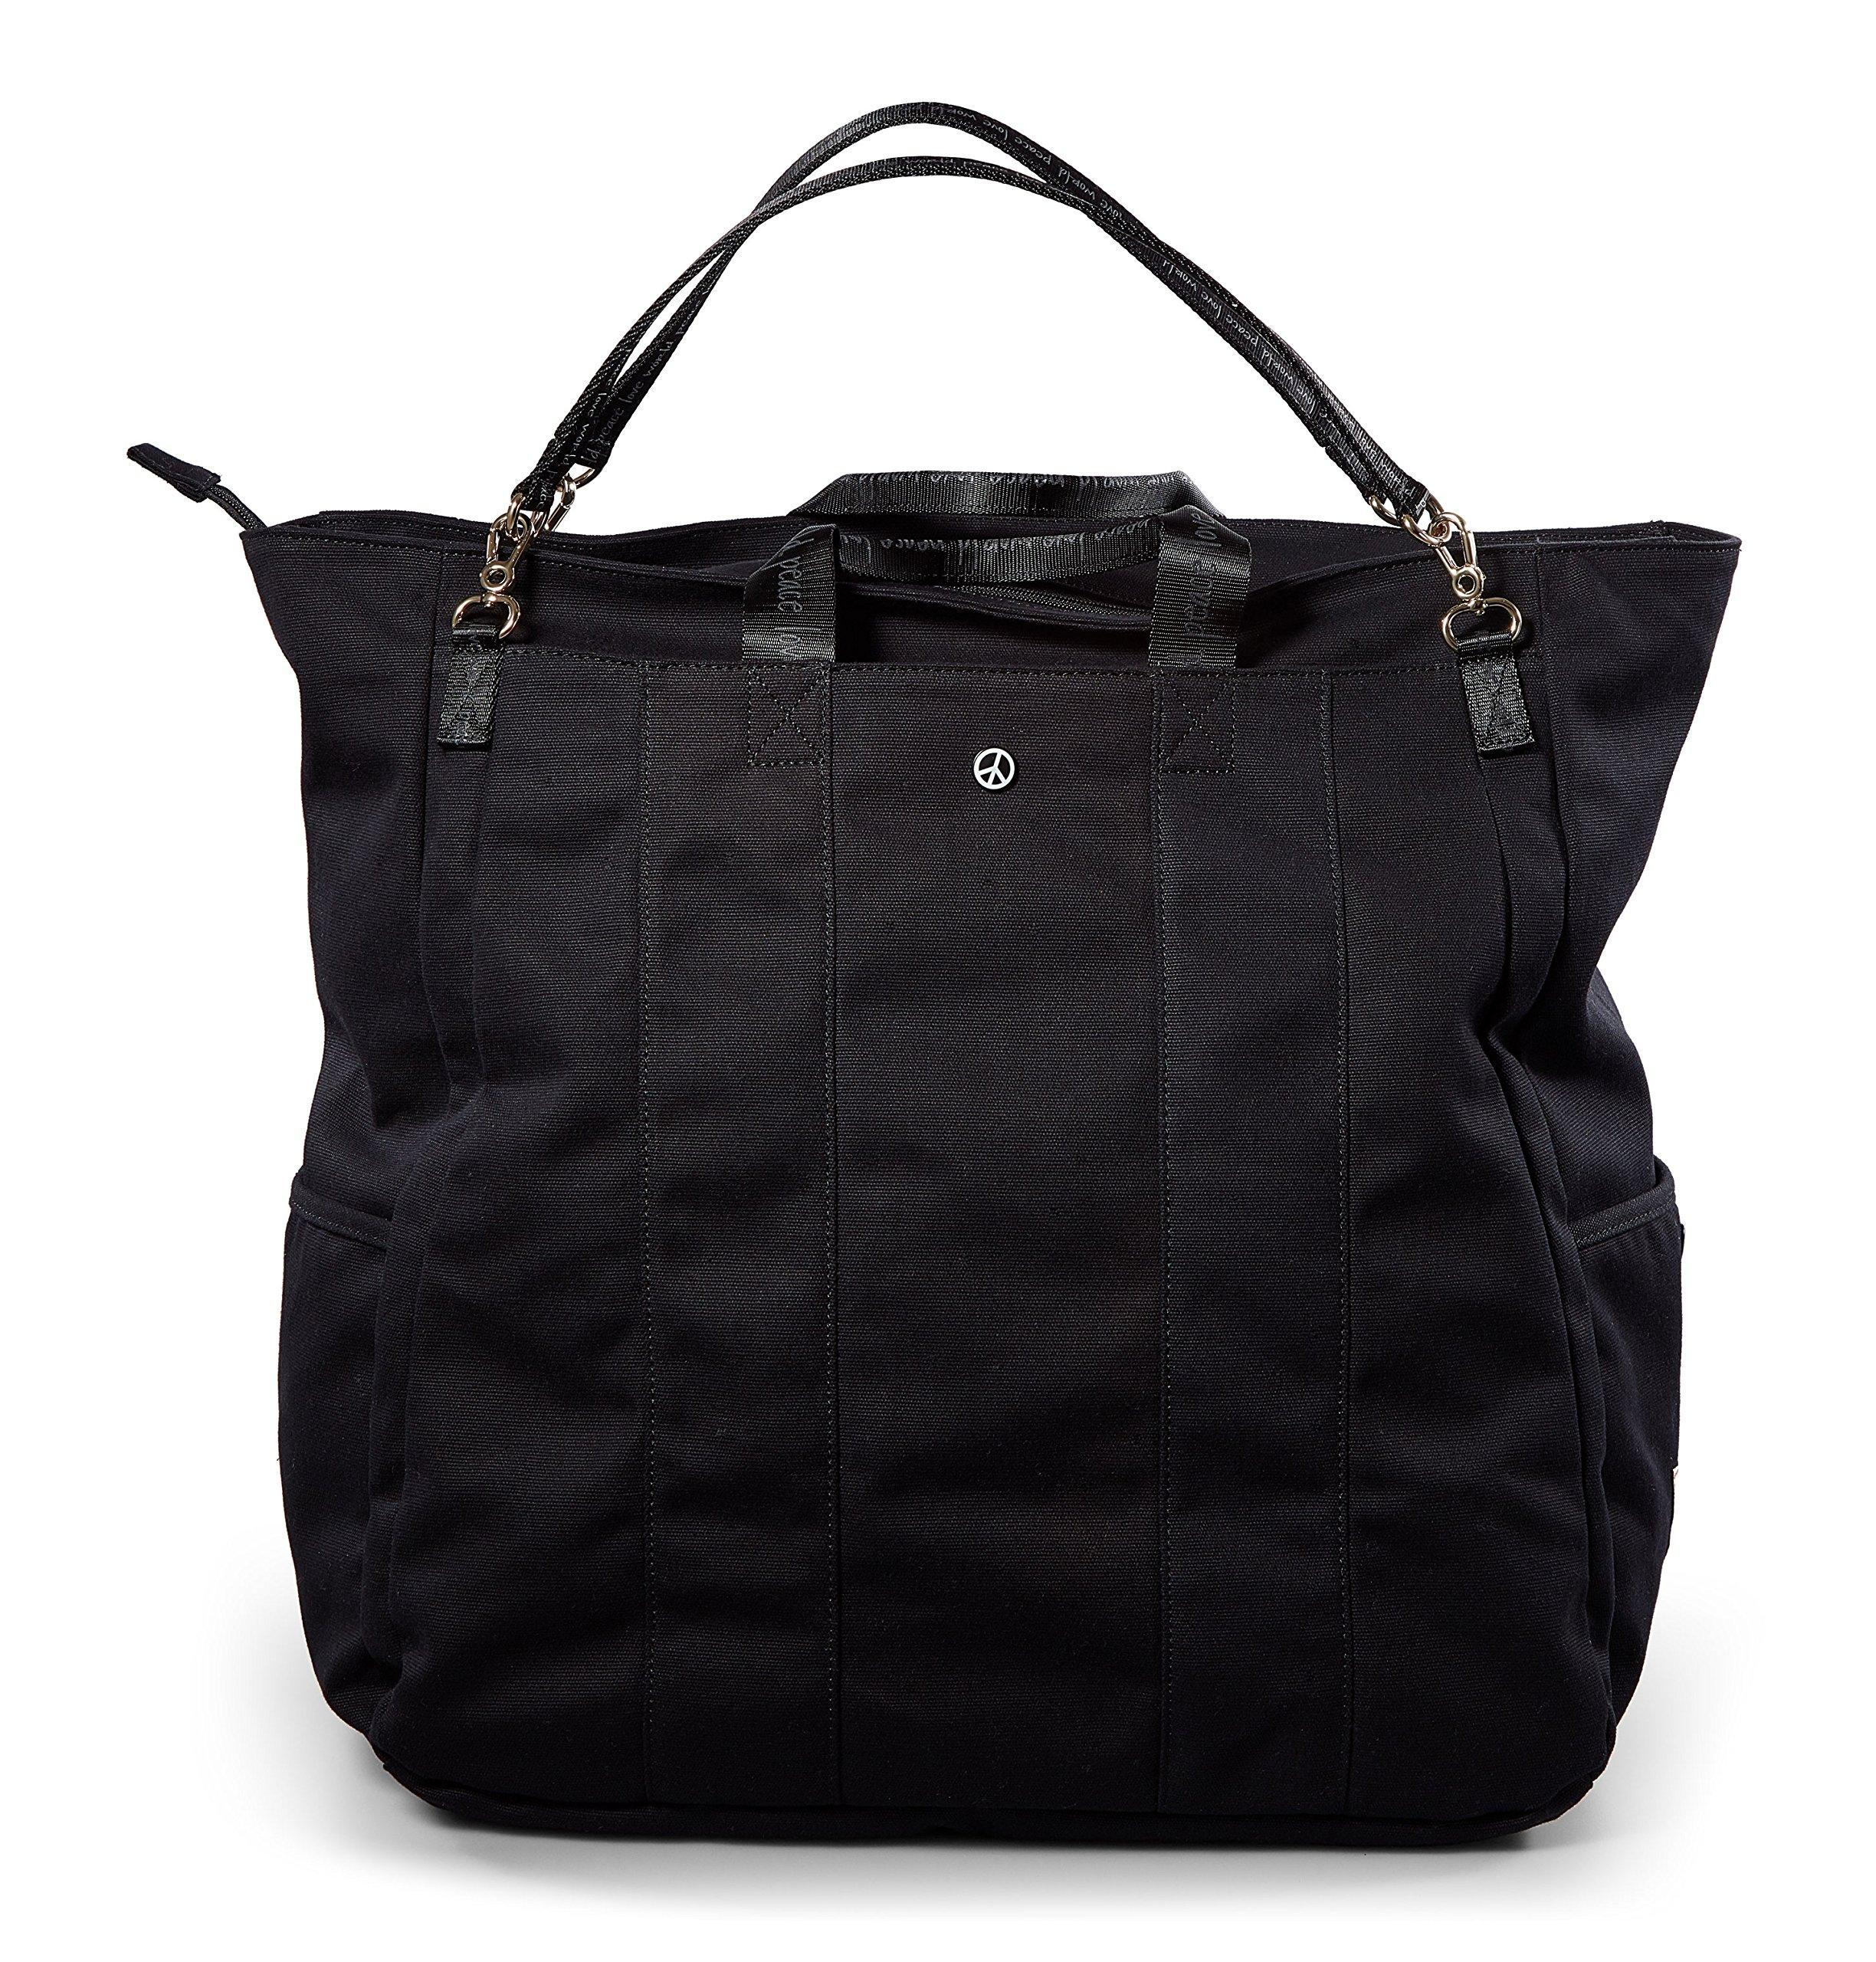 Peace Love World North Gym Duffle Bag South Gym Duffle Bag PLW204 Black (Black)